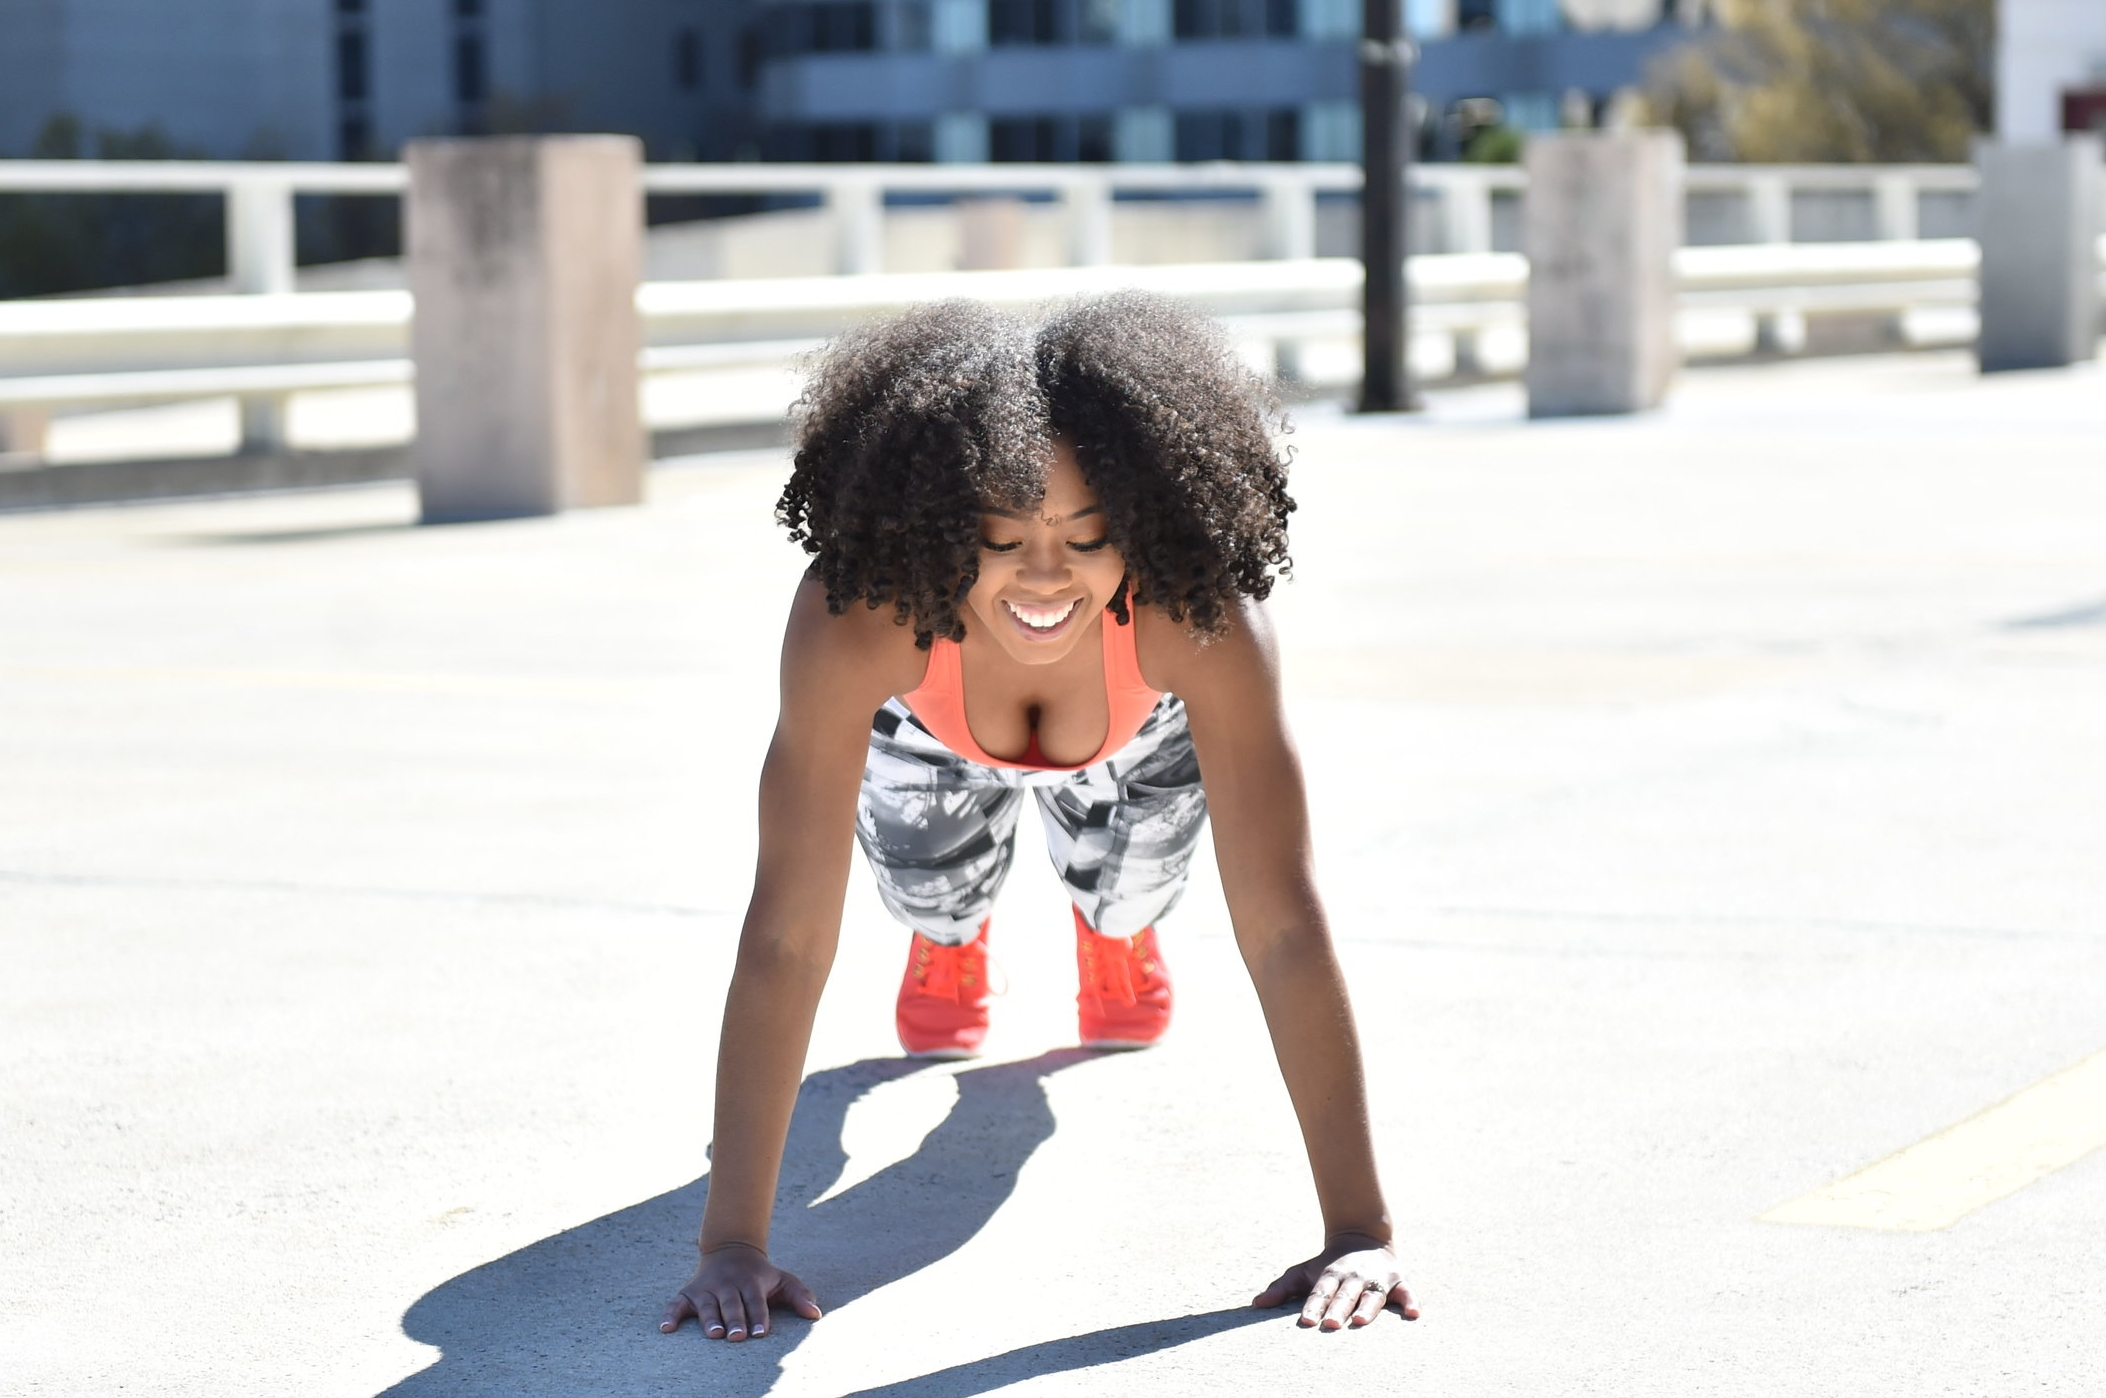 Fitness Lifestyle Beauty Blog Just Being Britt Jenkins Black Charlotte Blogger Influencer